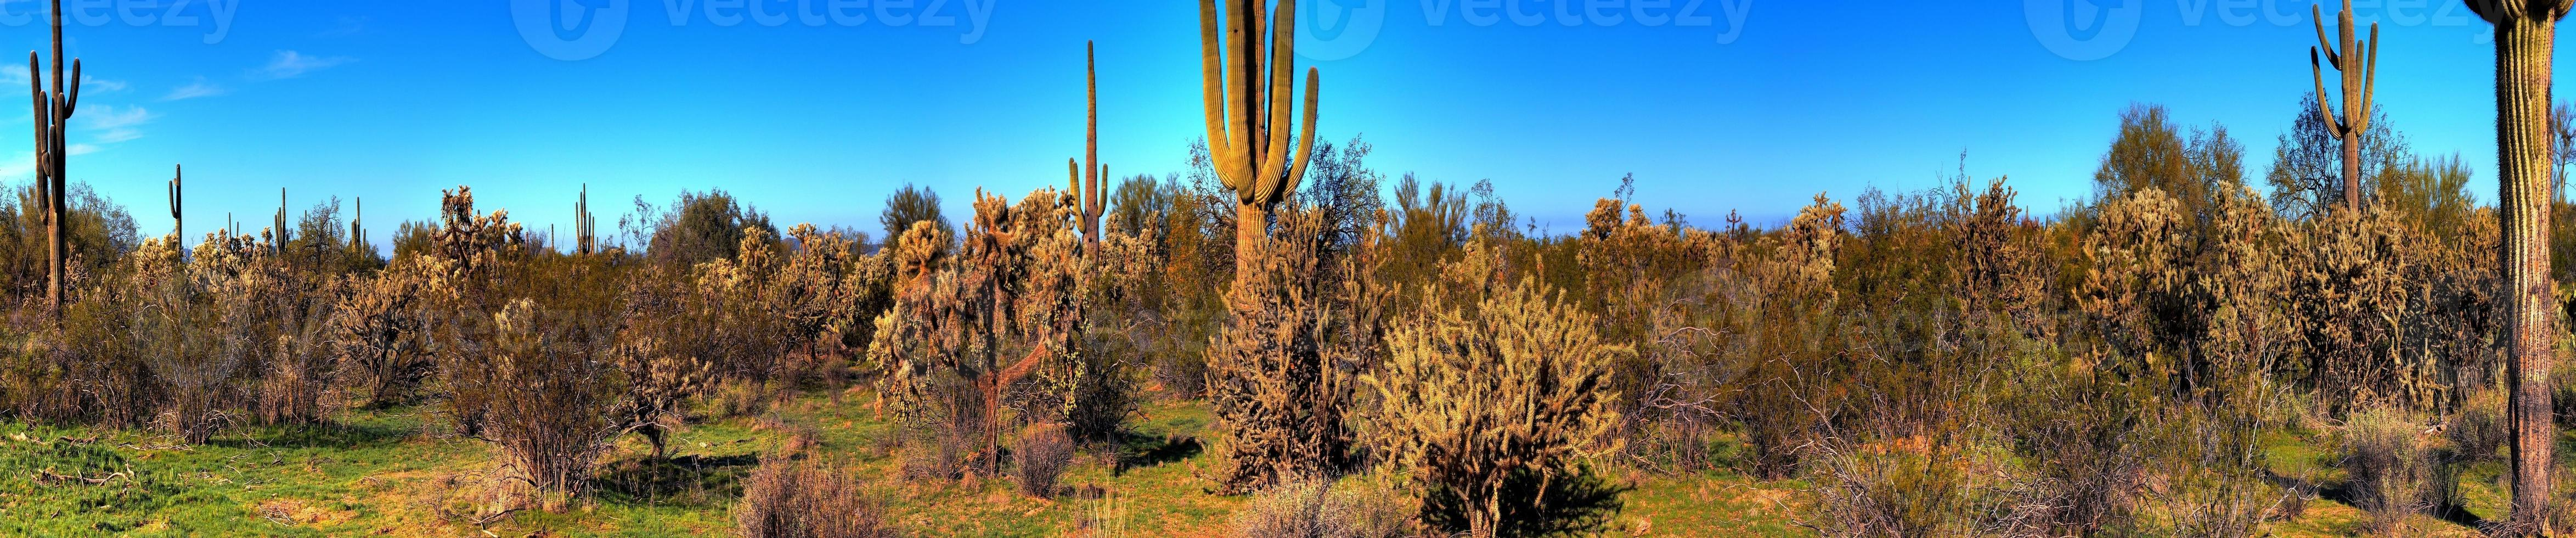 woestijn saguaro cactus panorama foto